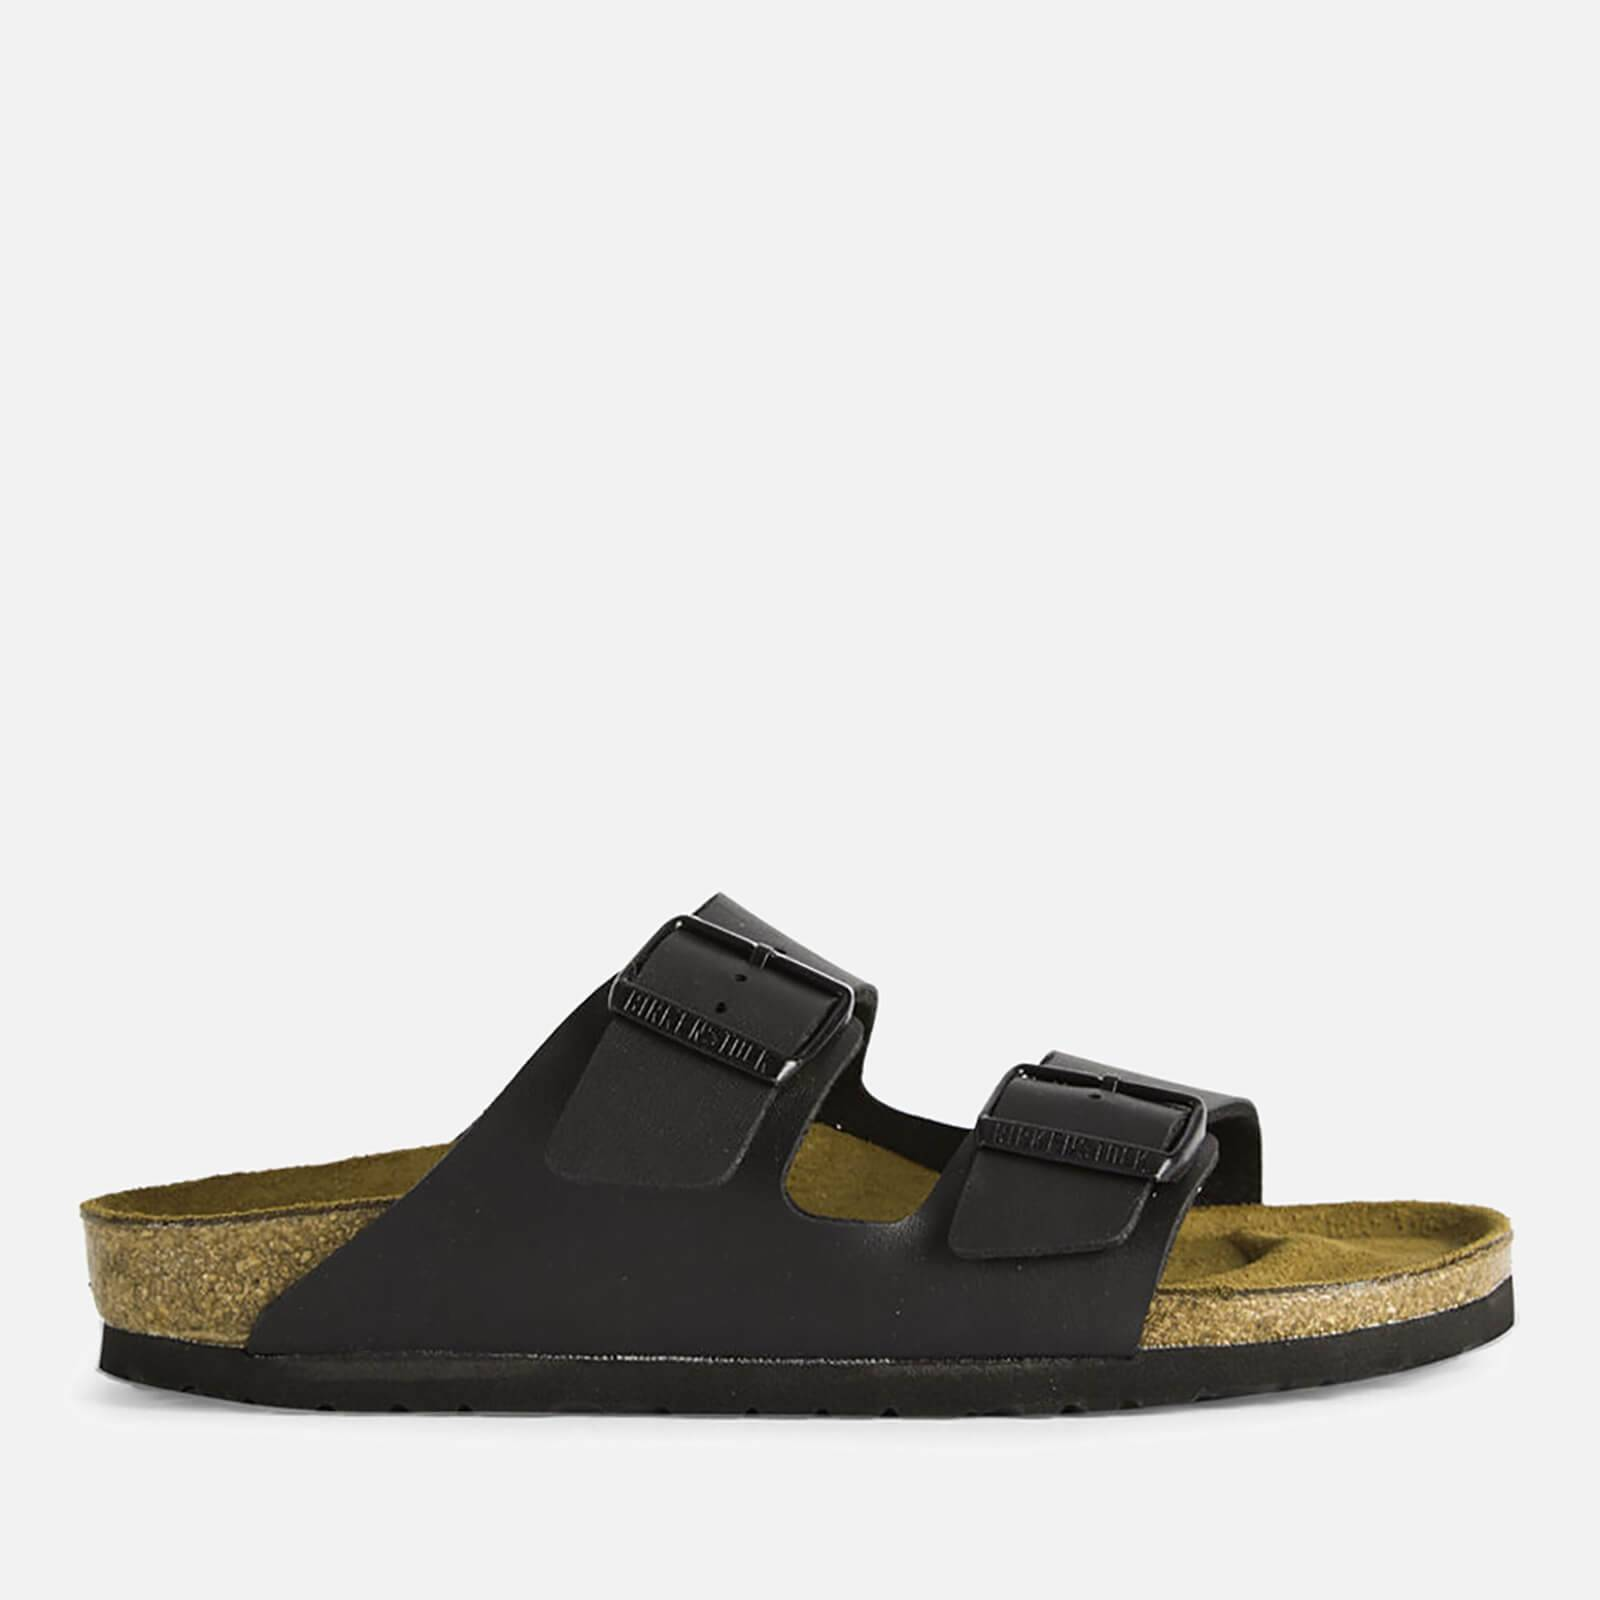 Birkenstock Women's Arizona Slim Fit Double Strap Sandals - Black - EU 37/UK 4.5